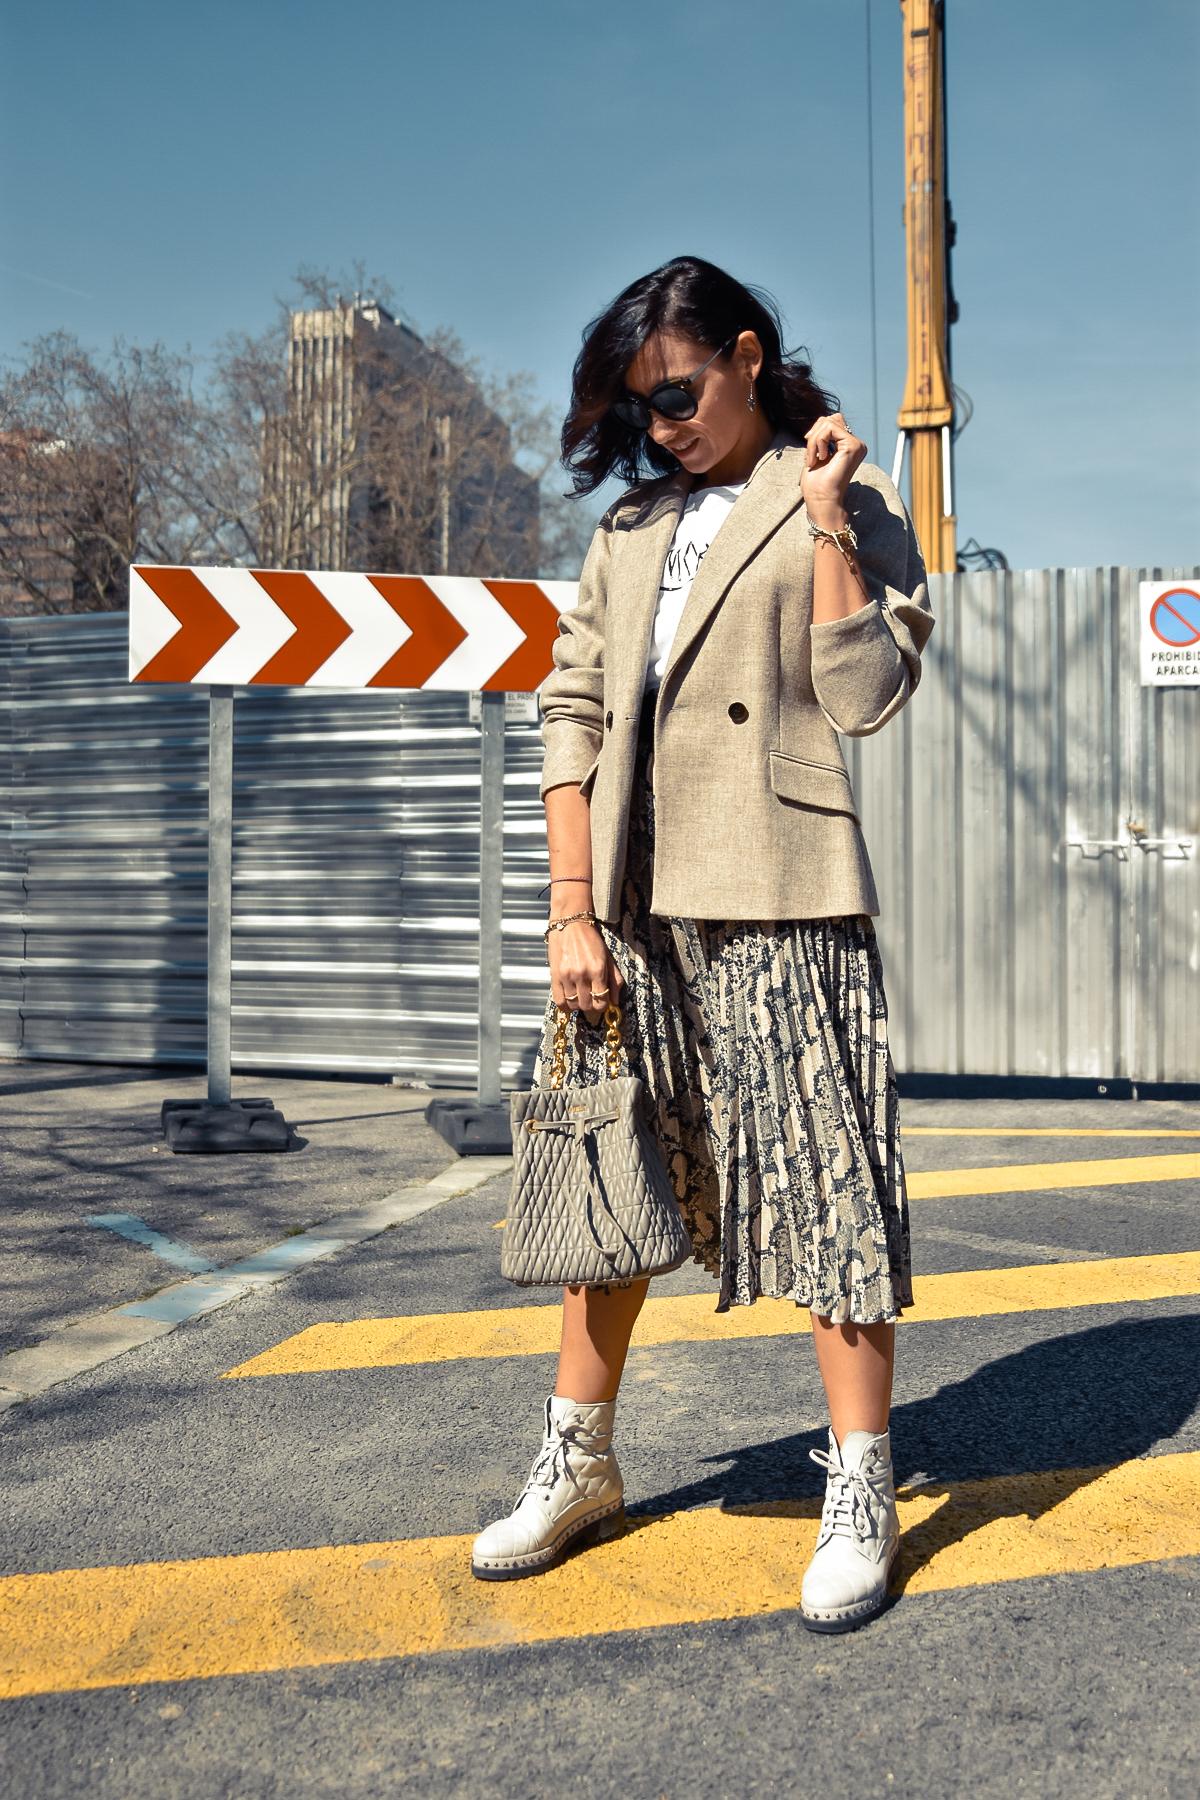 el-blog-de-silvia-look-falda-animal-print-balzer-04